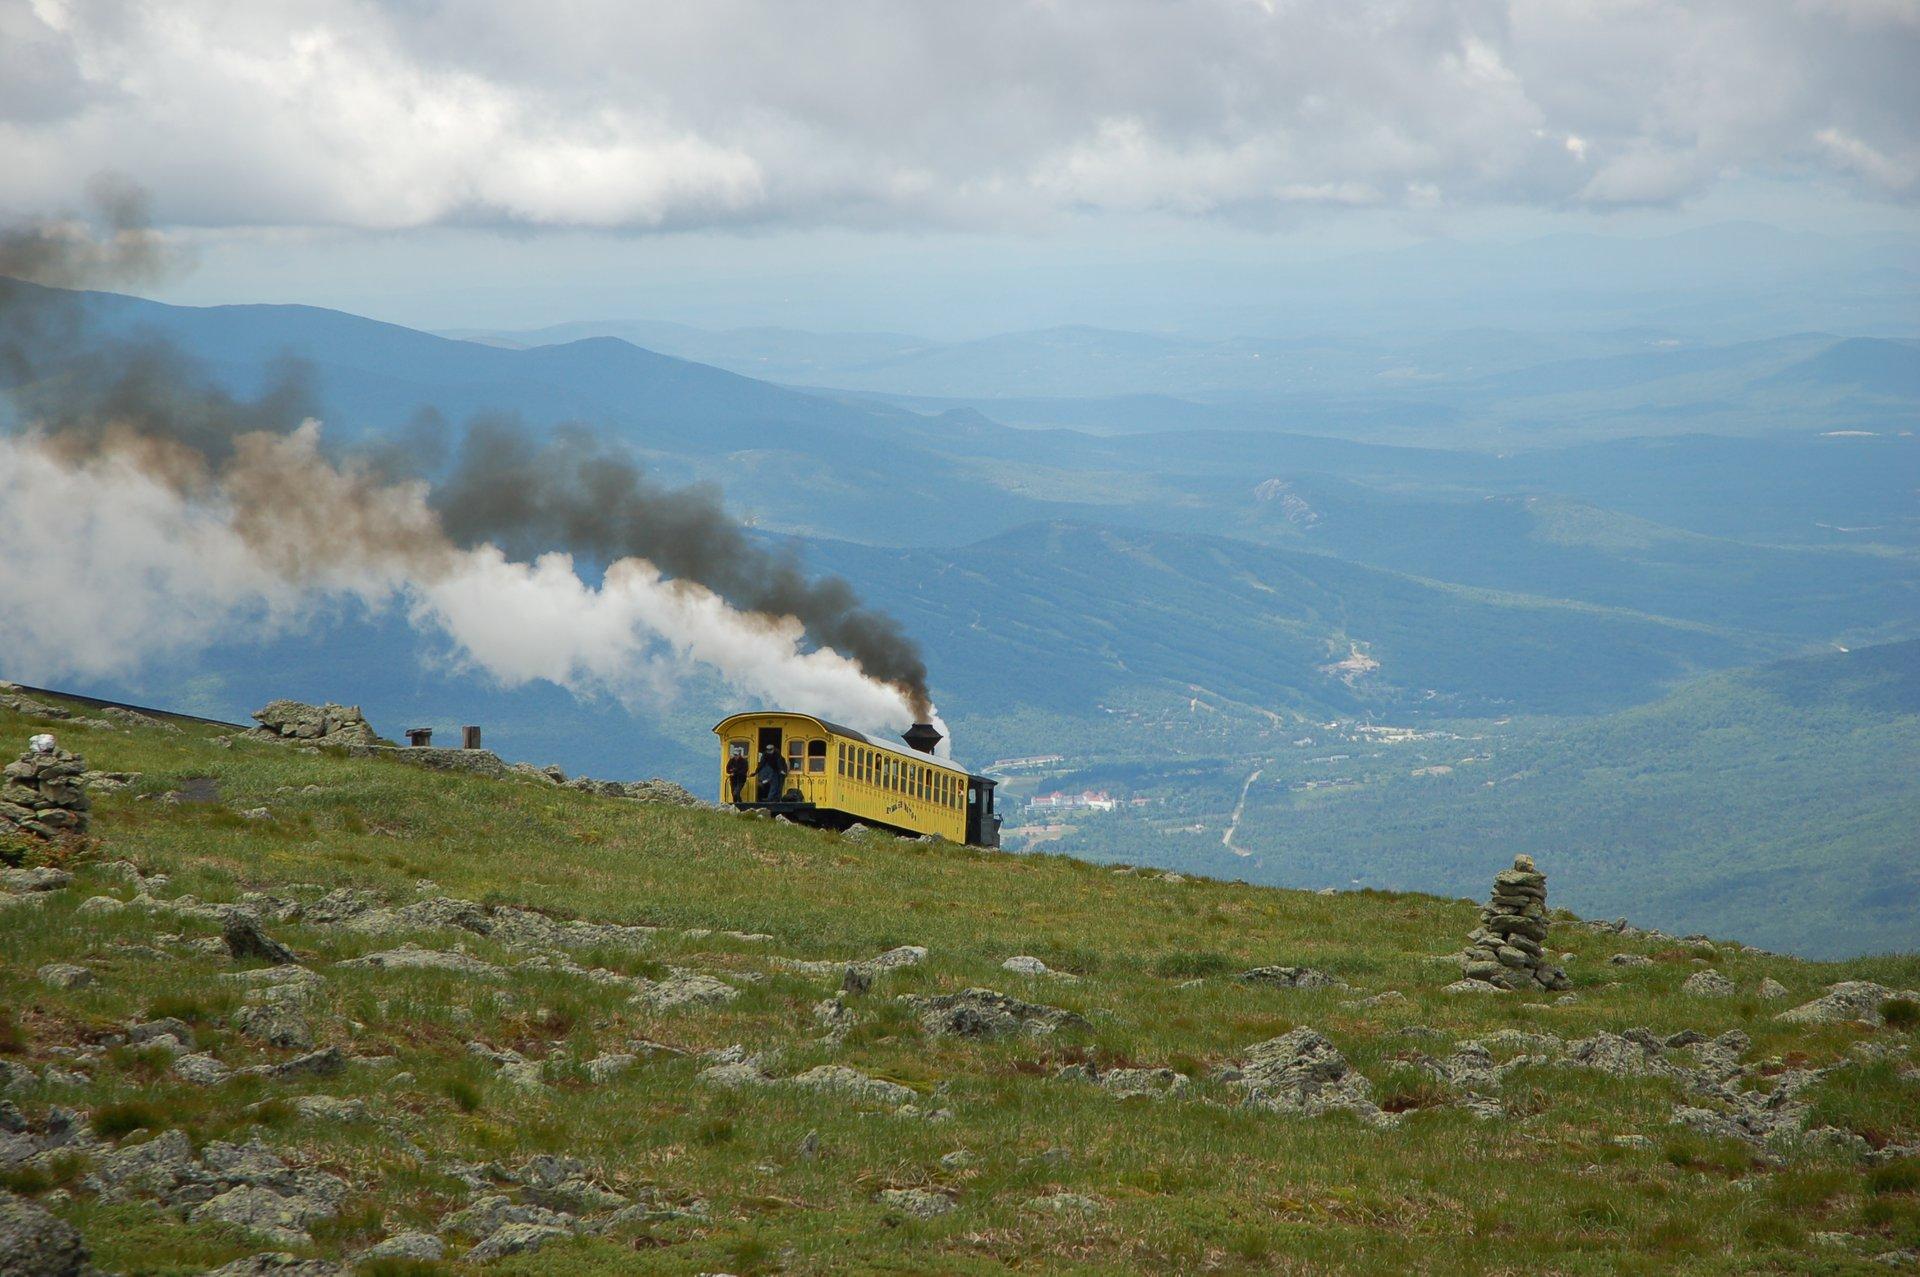 The cog rail descending 2020